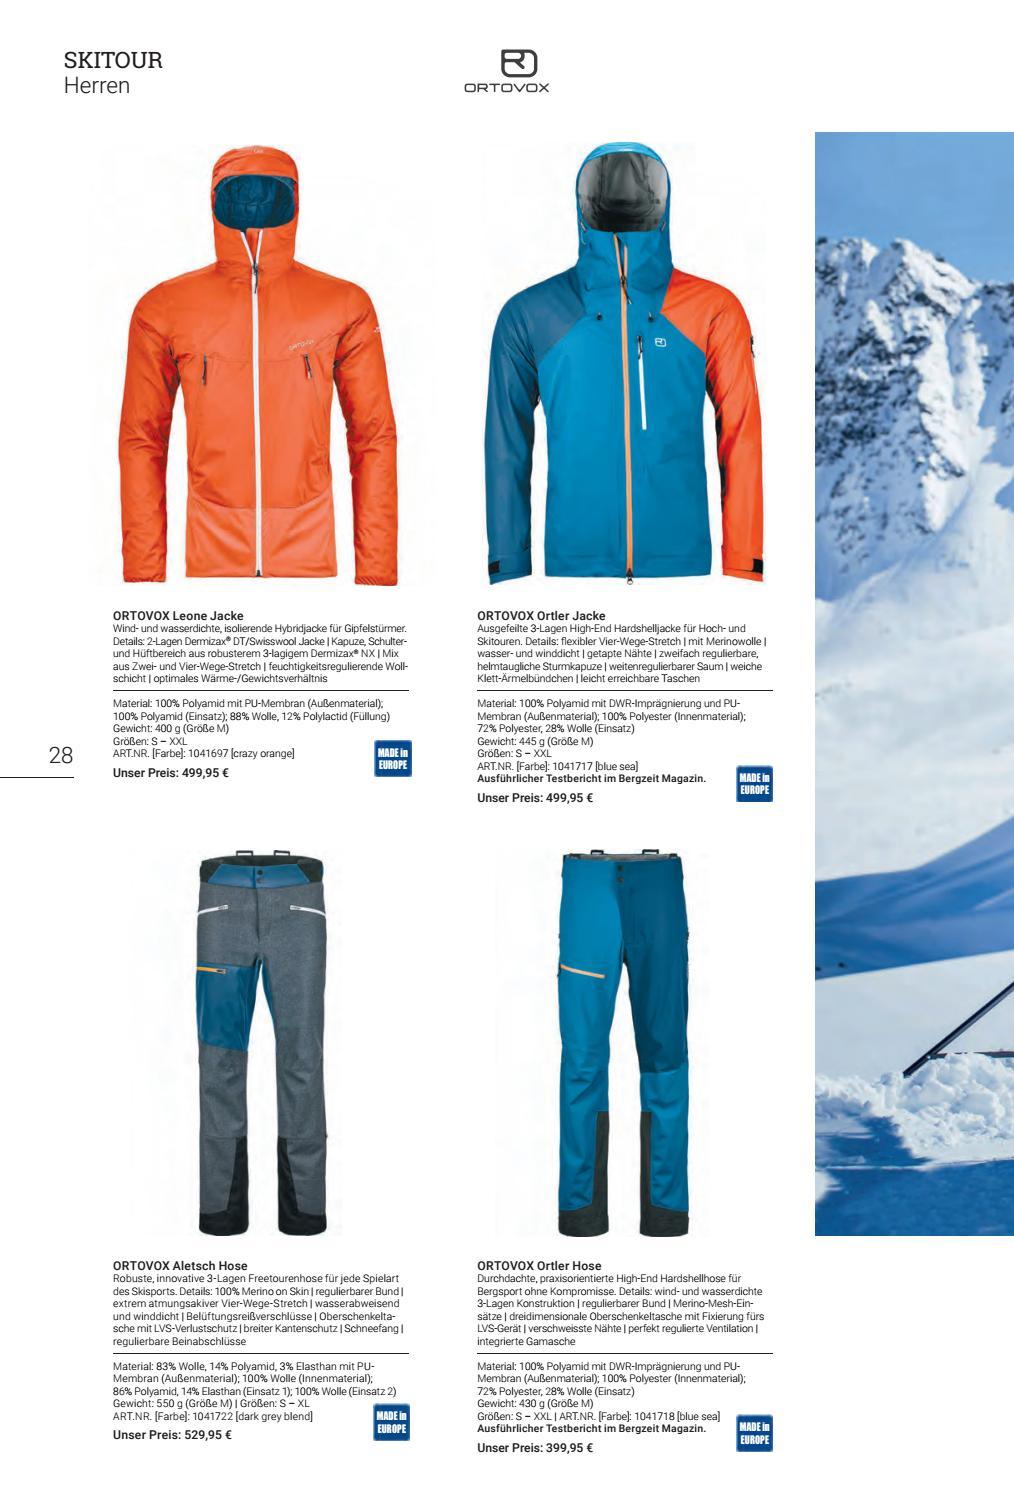 Bergzeit Winterhandbuch 17 18 by BERGZEIT issuu